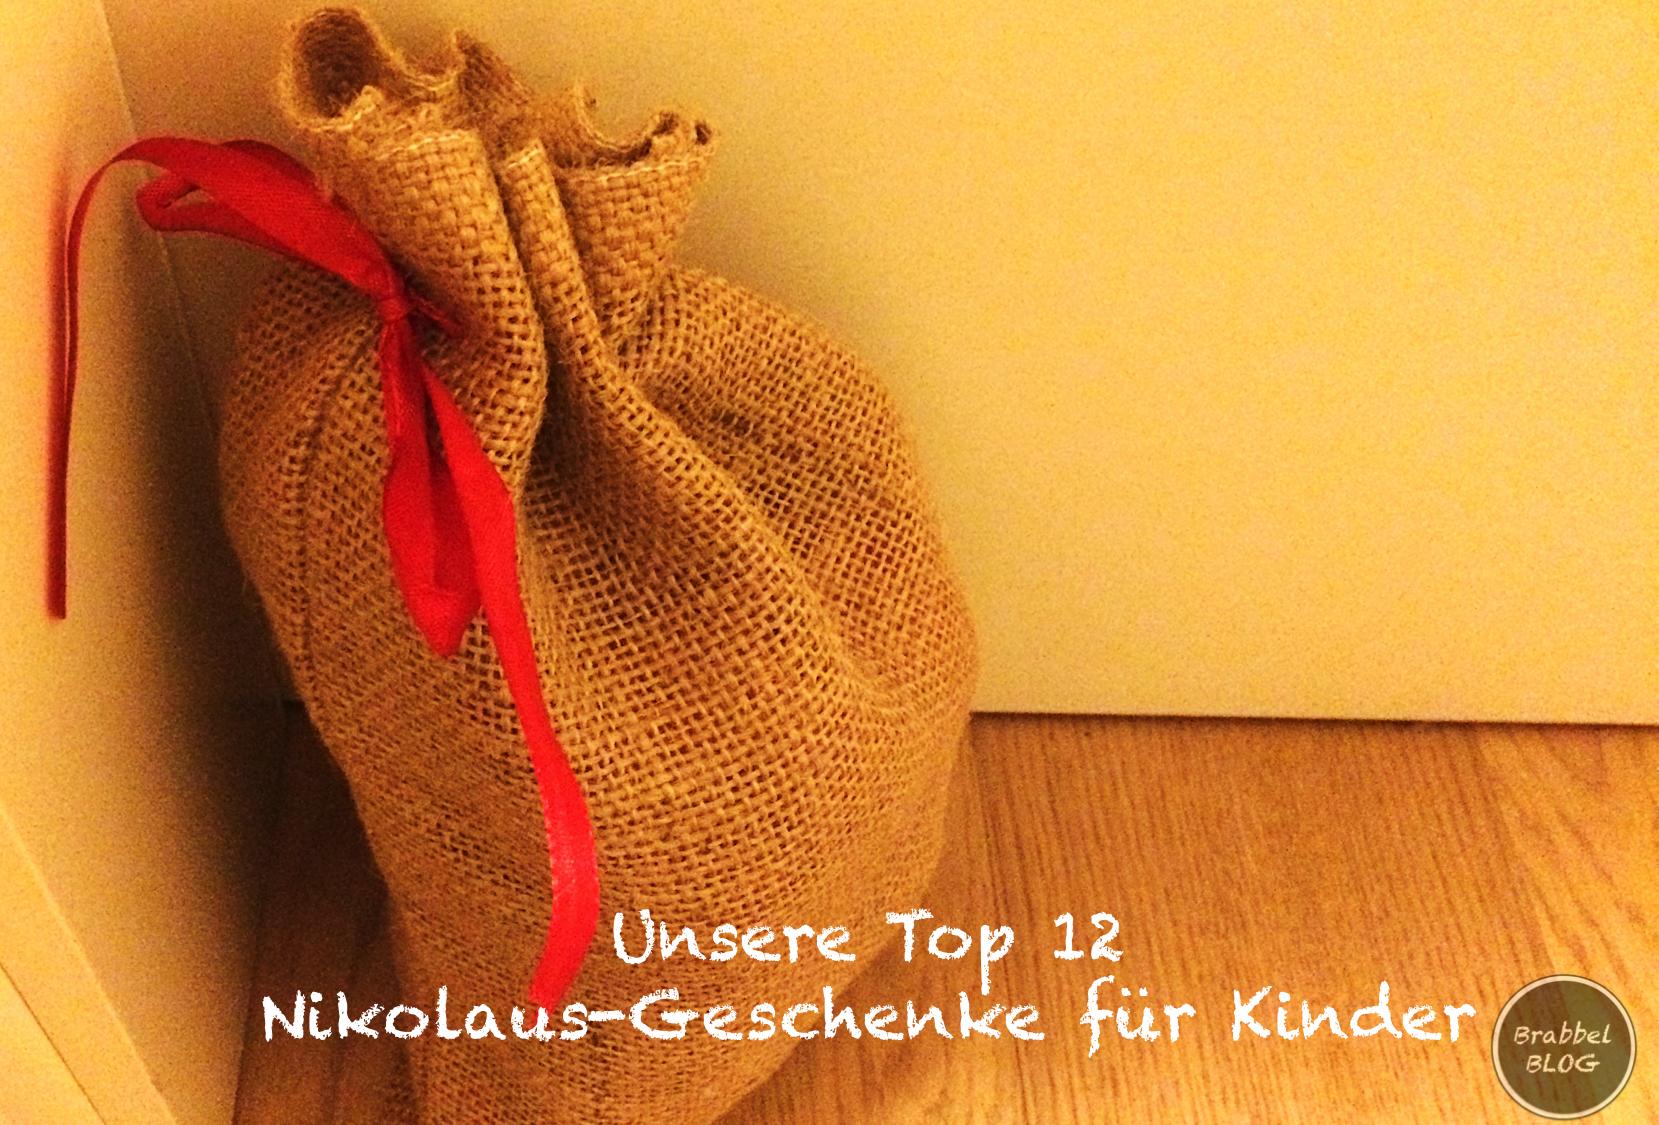 Hohoho Unsere Top 12 Nikolaus Geschenke Fur Kinder